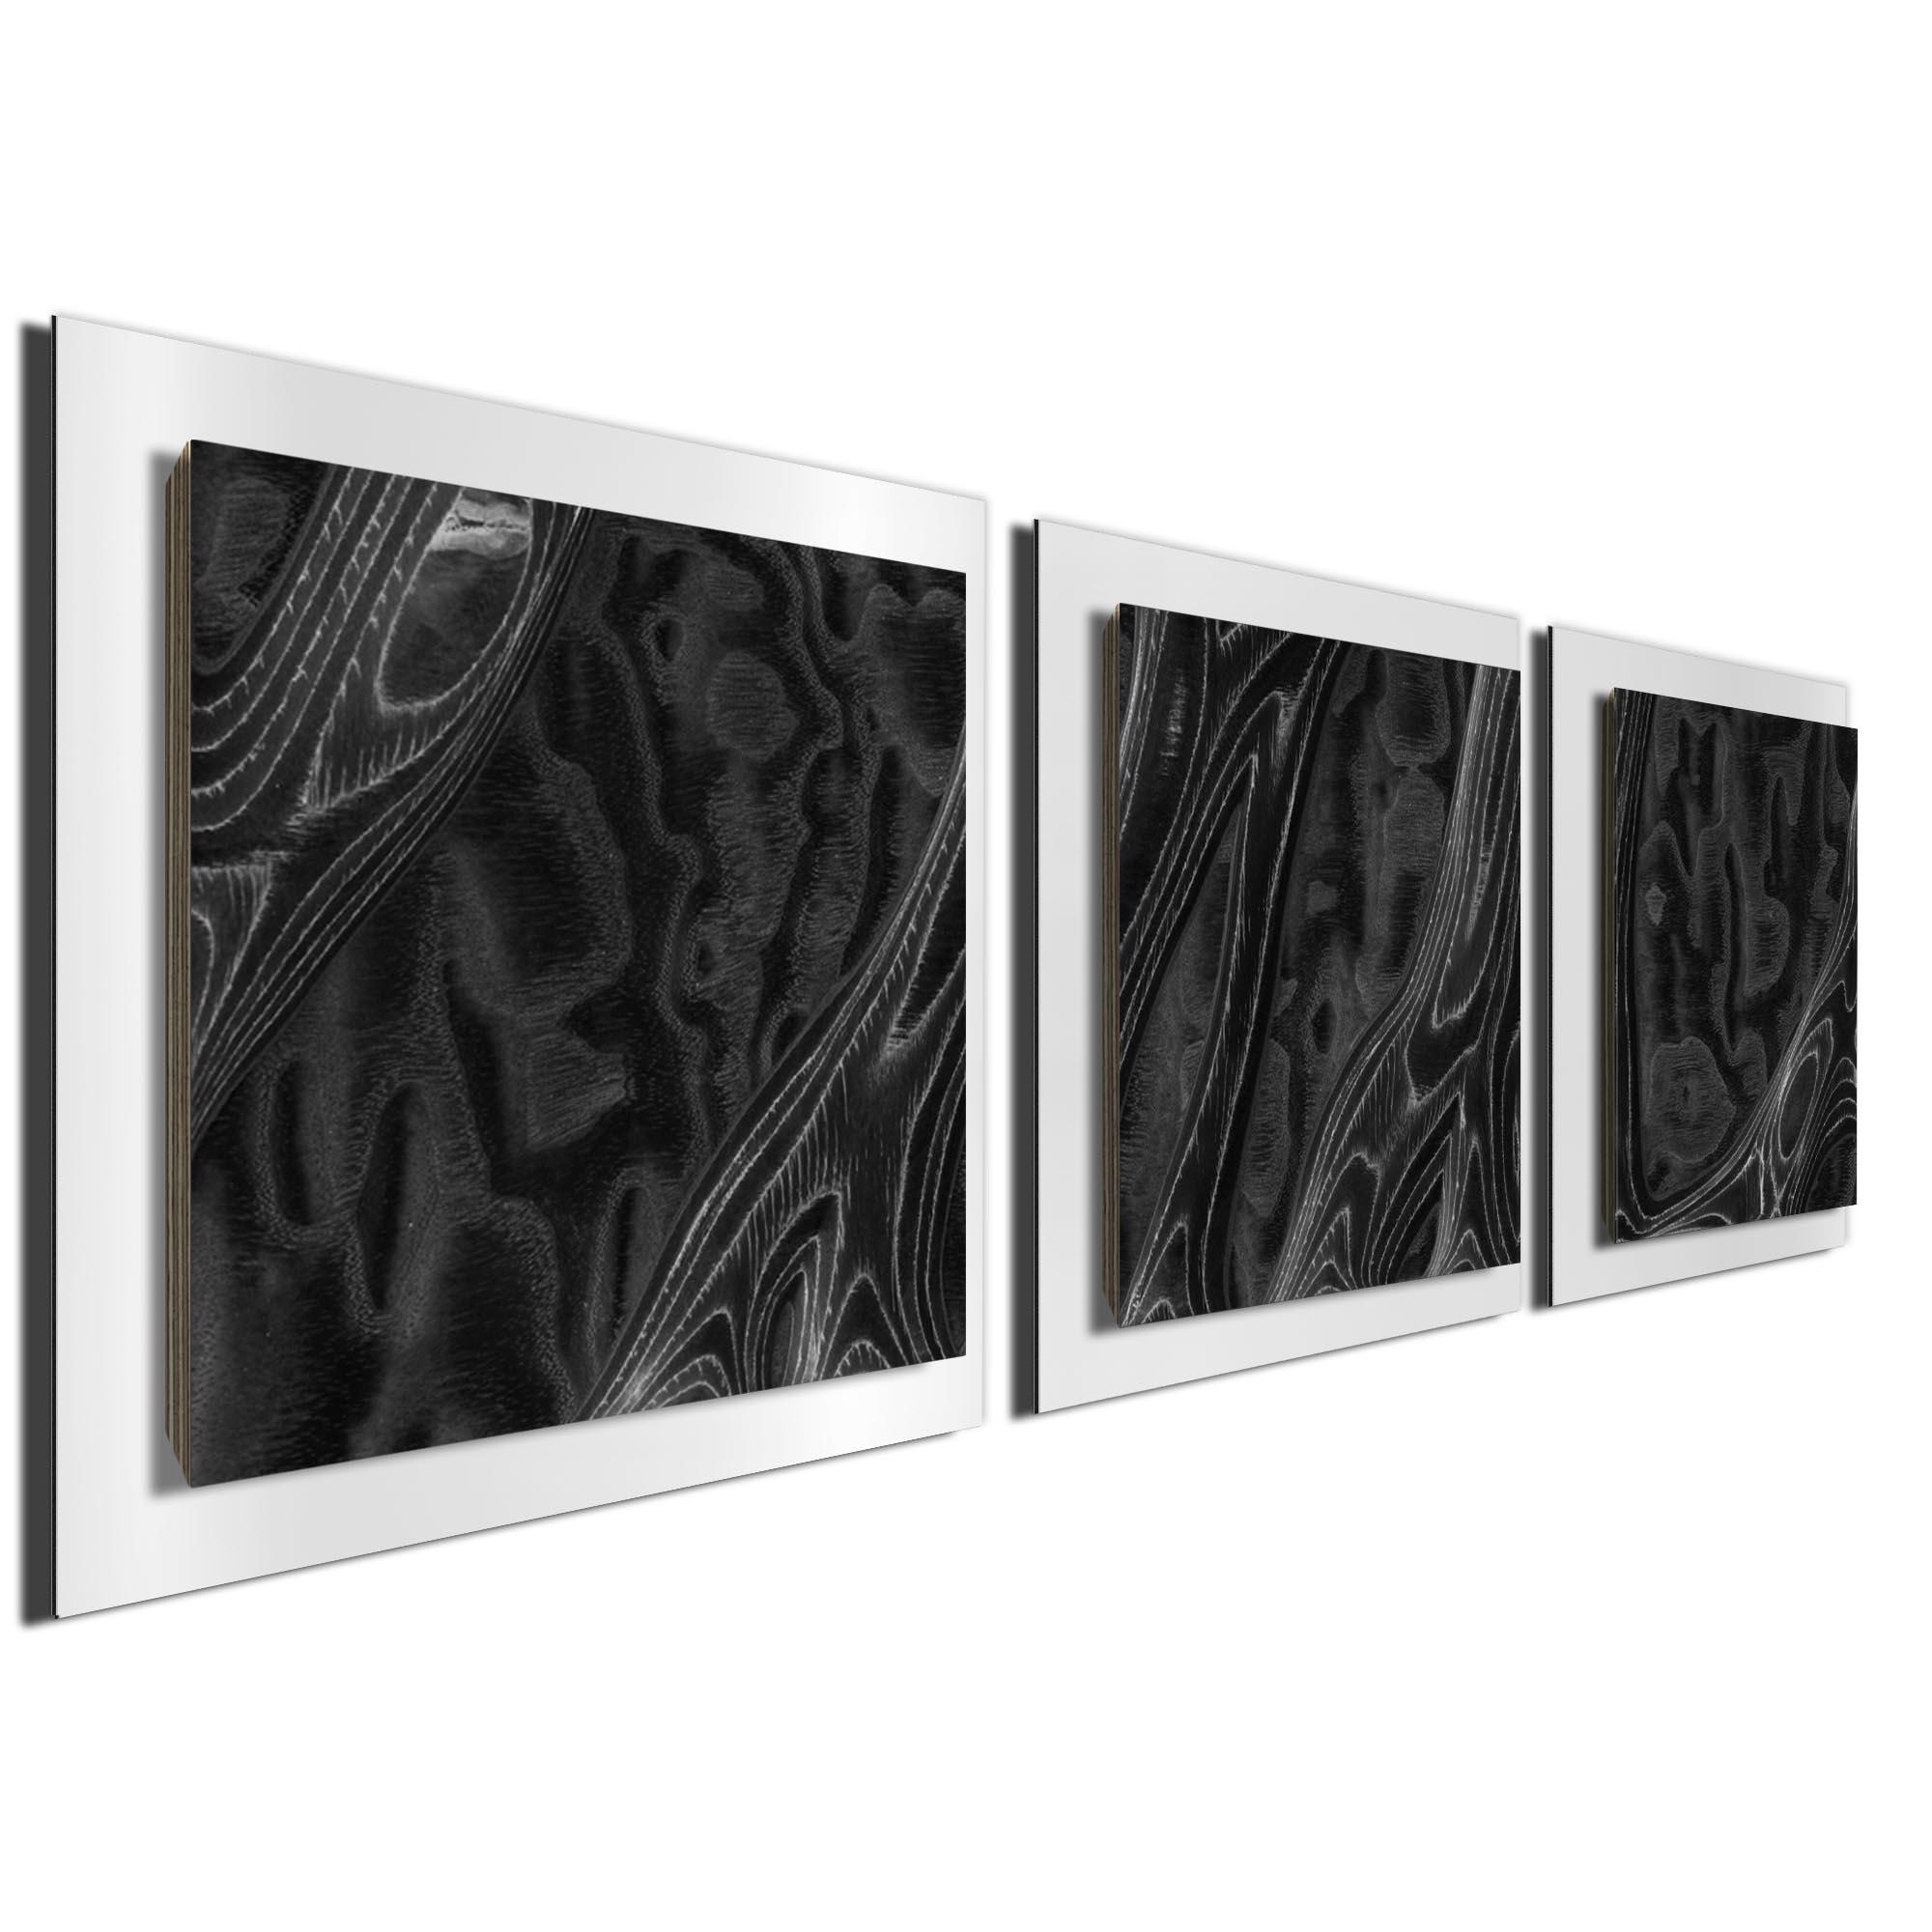 Ebony Burl Essence White by Jackson Wright Rustic Modern Style Wood Wall Art - Image 2